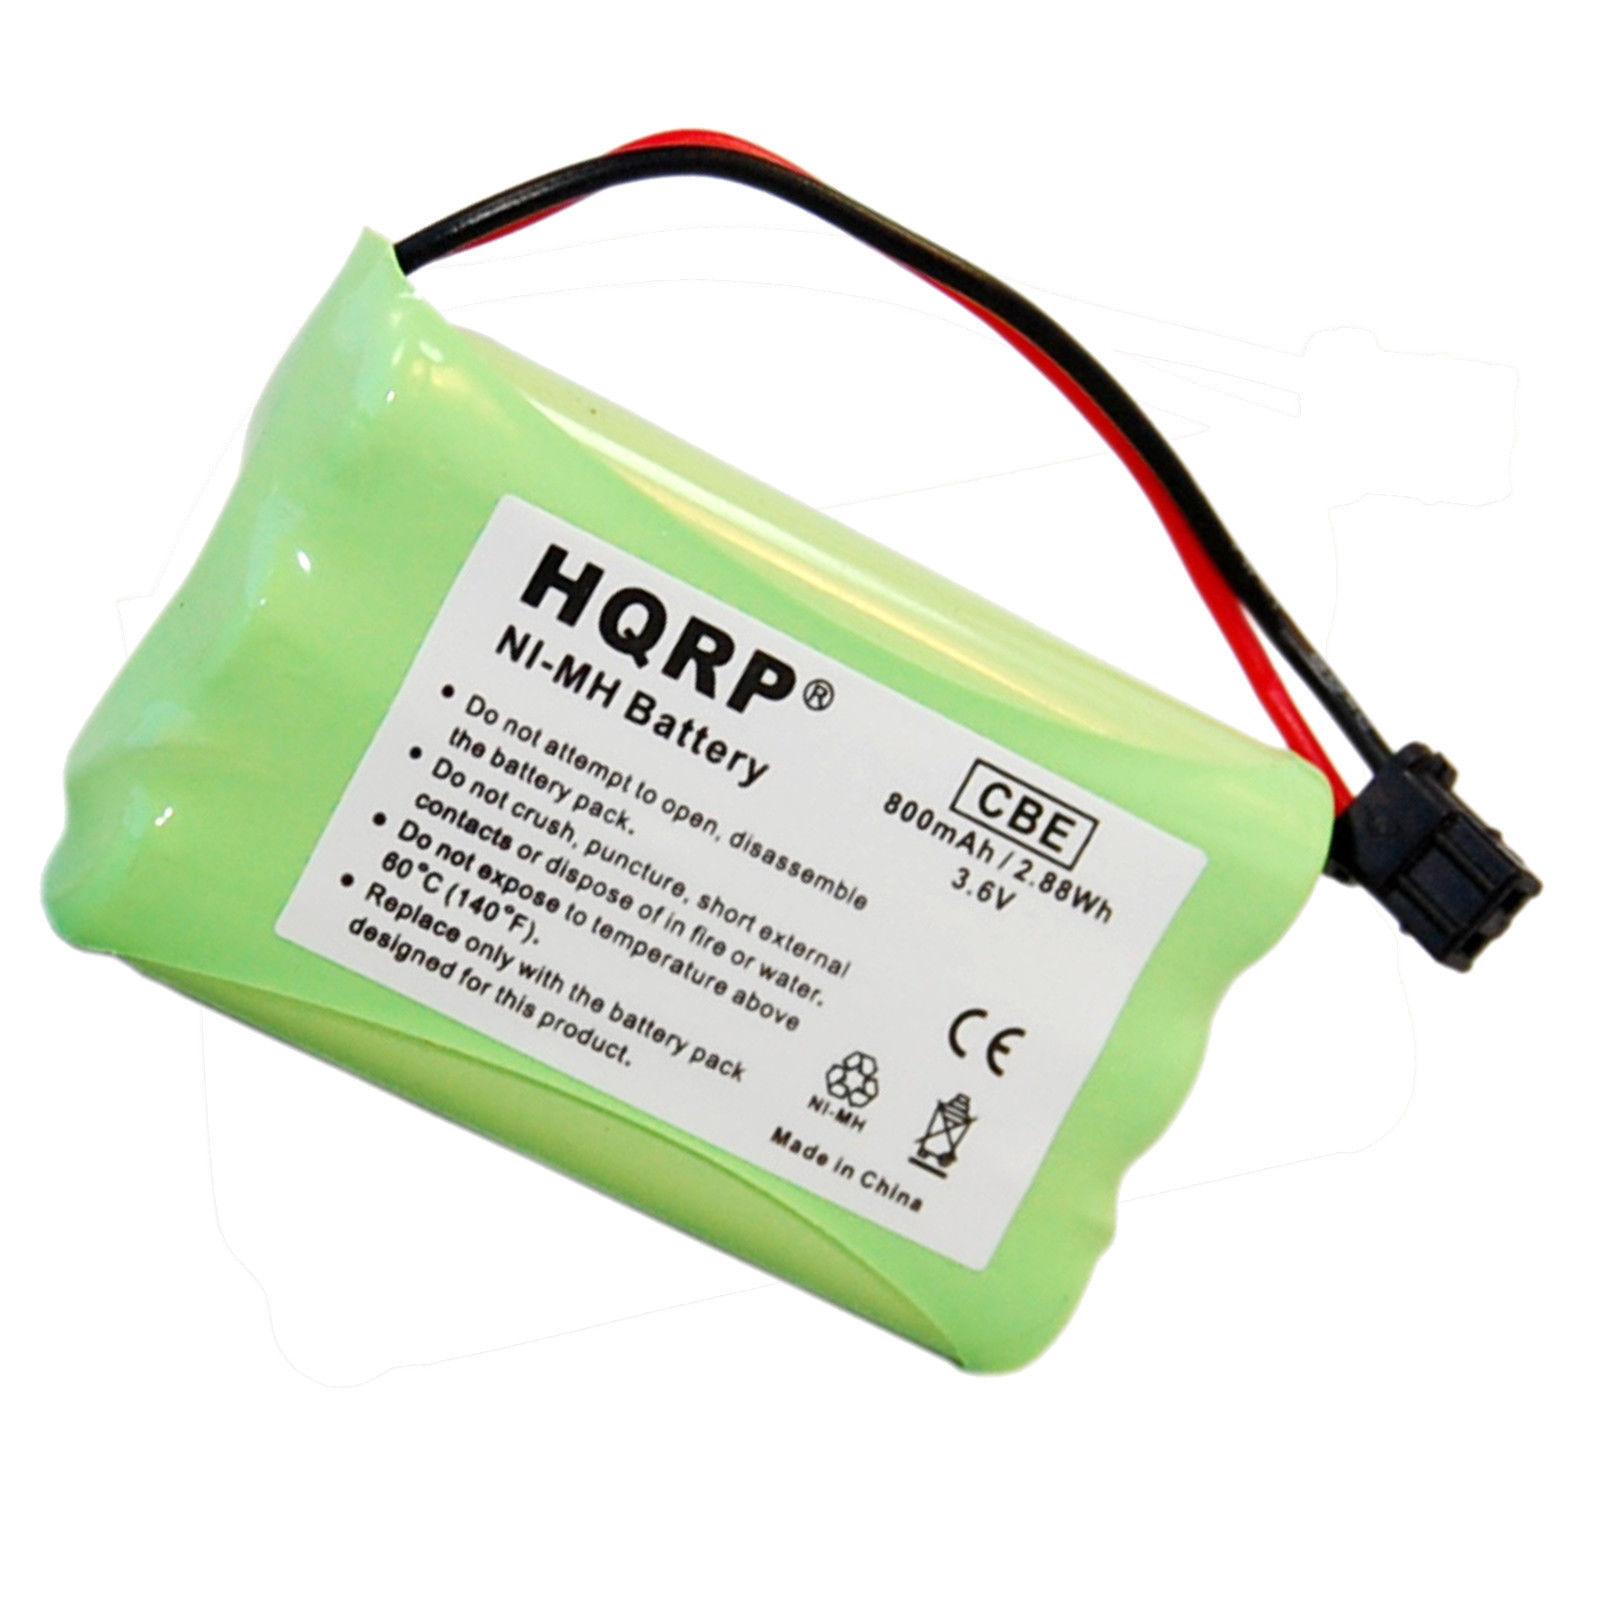 HQRP Home Cordless Phone Battery for Uniden DCT646 DCT646-2 DCT646-3 DCT646-4 image 2